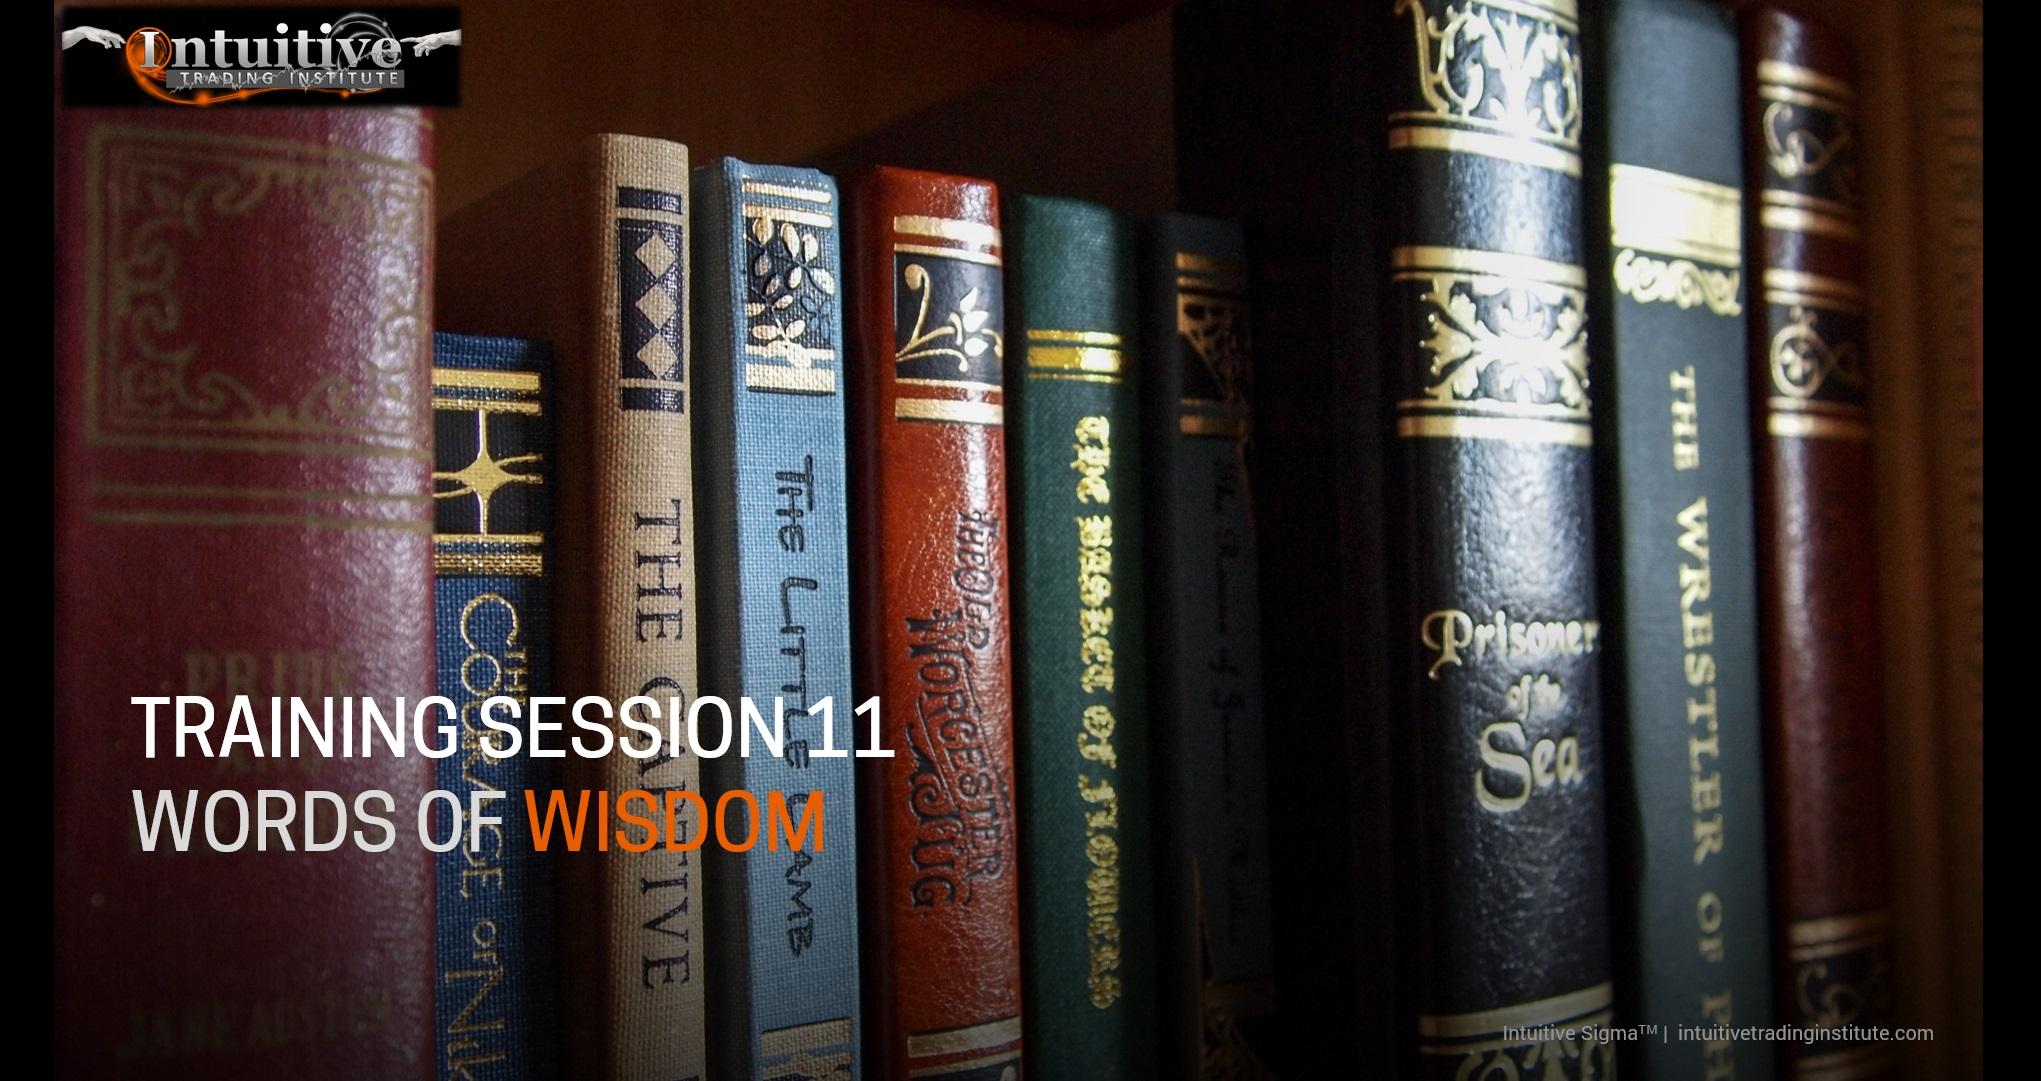 Trainining Session 11